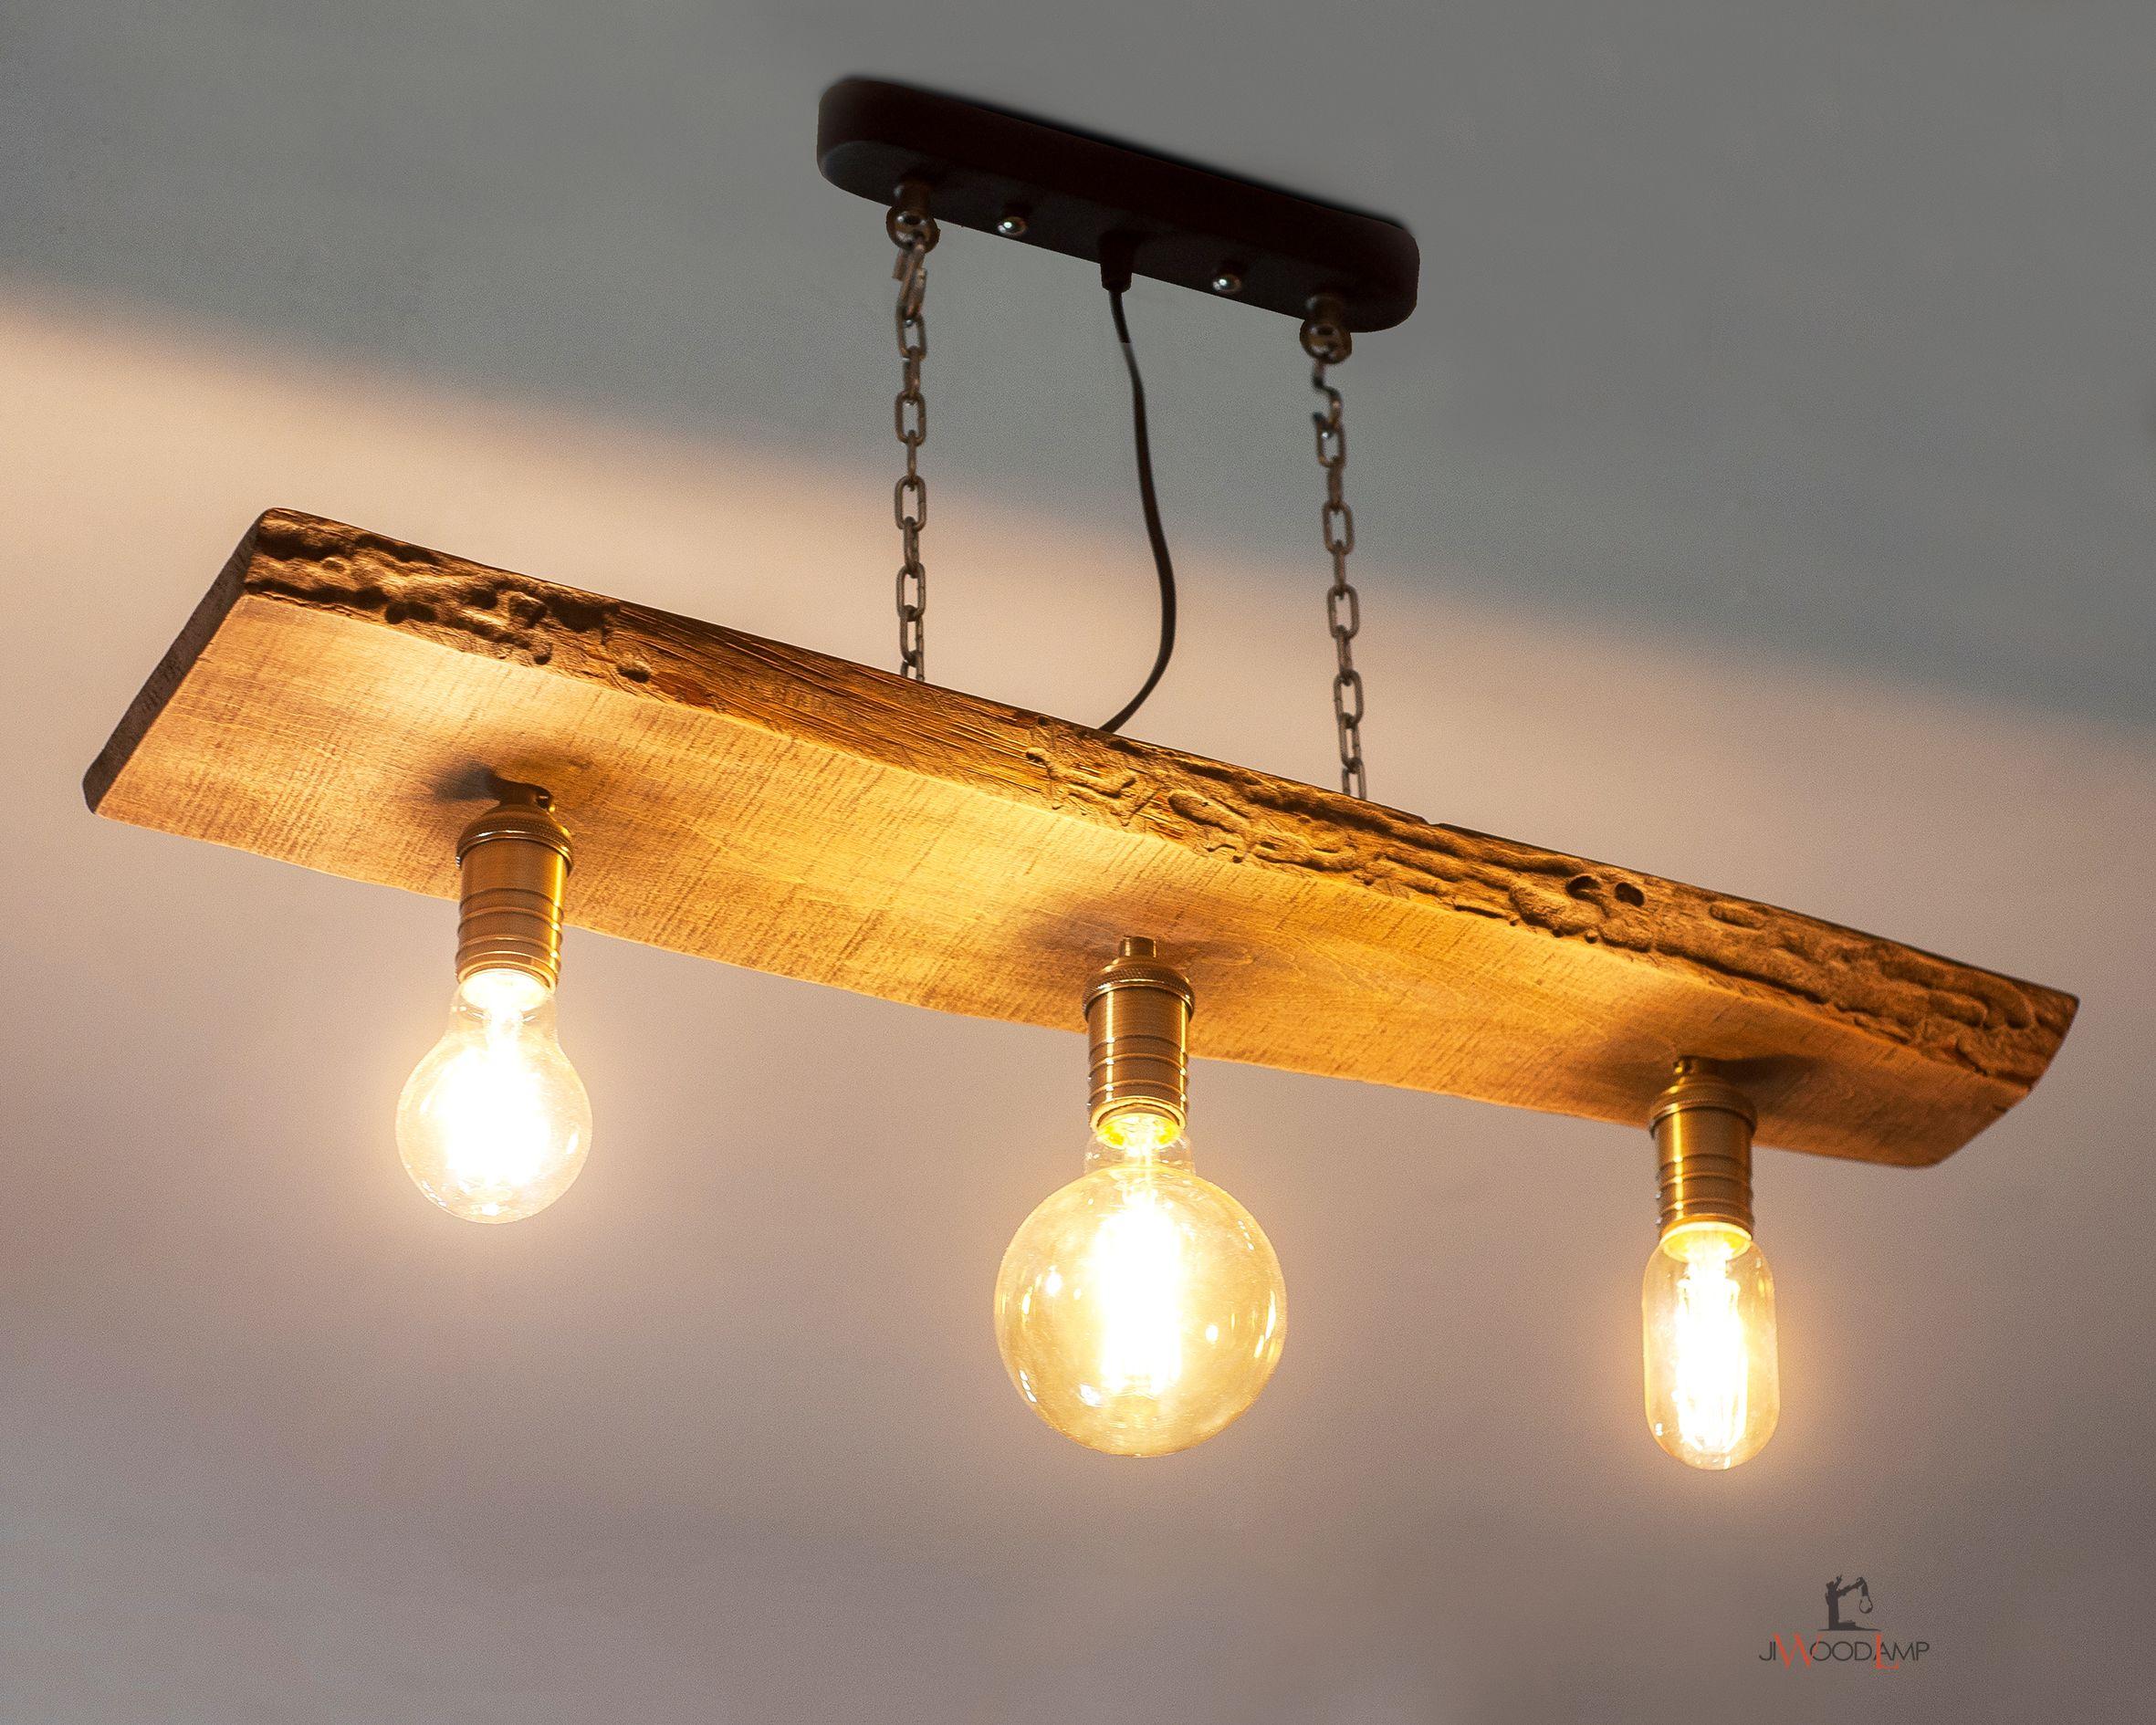 Wood Pendant Lamp Three Bulb Wood Hanging Lamp Pendant Light Wood Lamp Wooden Lamp Wooden Chandelier Wood Hanging Lamp Ceiling Lamp In 2020 Wood Pendant Lamps Wooden Chandelier Wooden Lamp